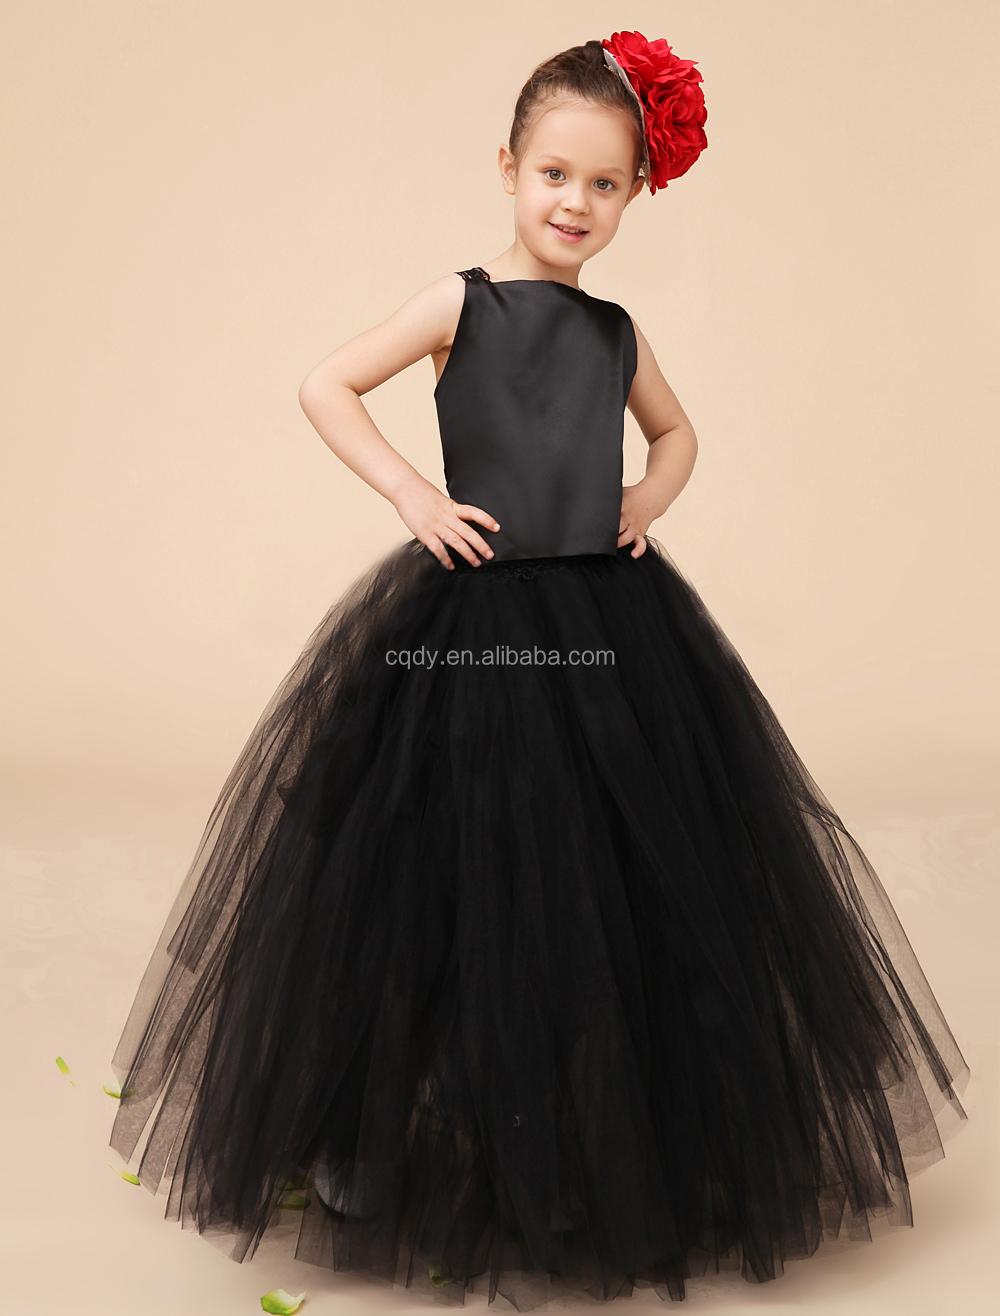 Children Black Cotton Frocks Design For Flower Girls Summer Party ...